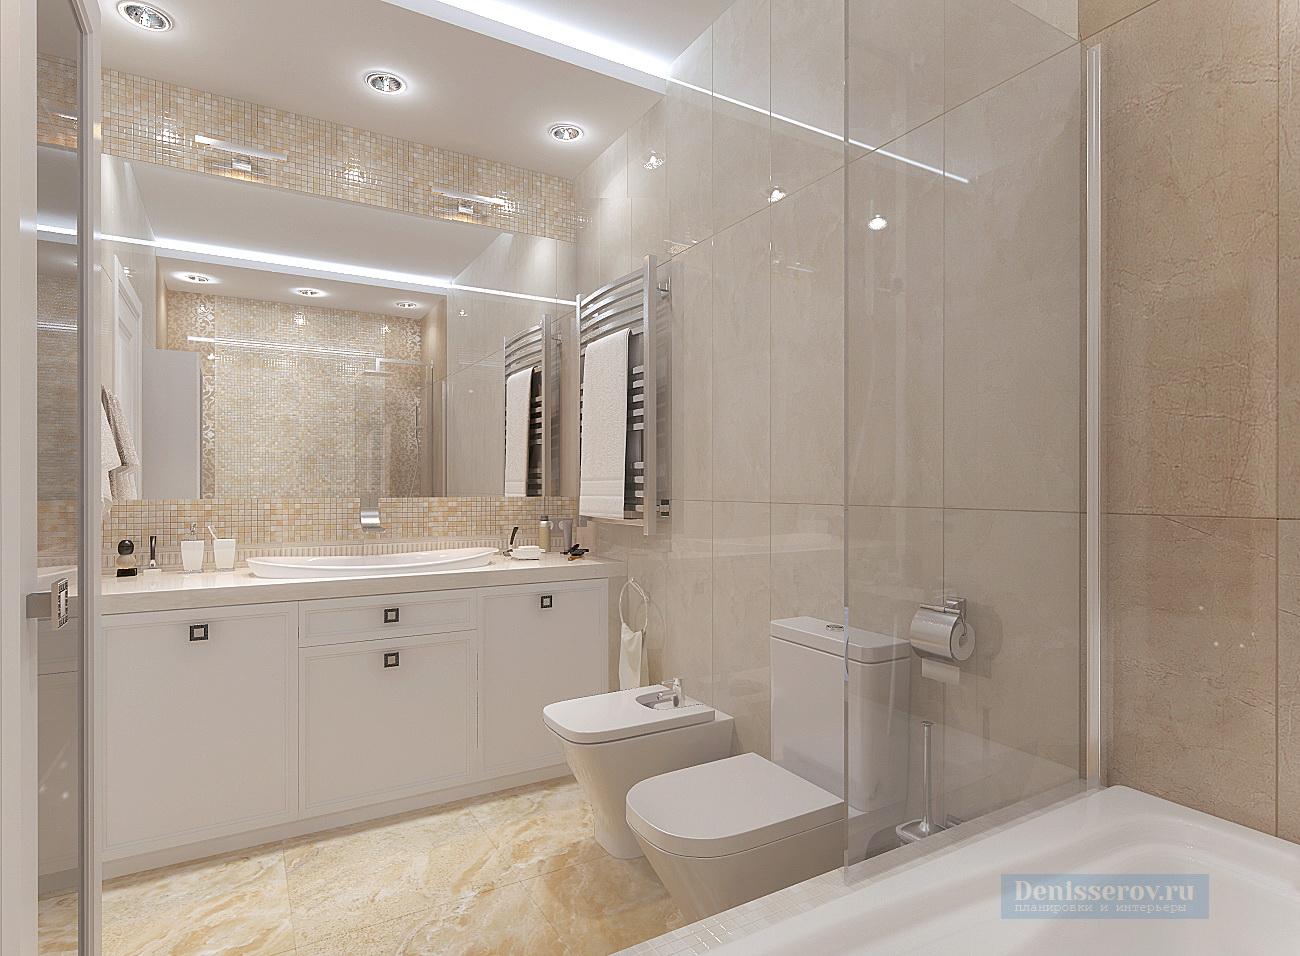 ванна 7 кв.м. в бежево-белой гамме